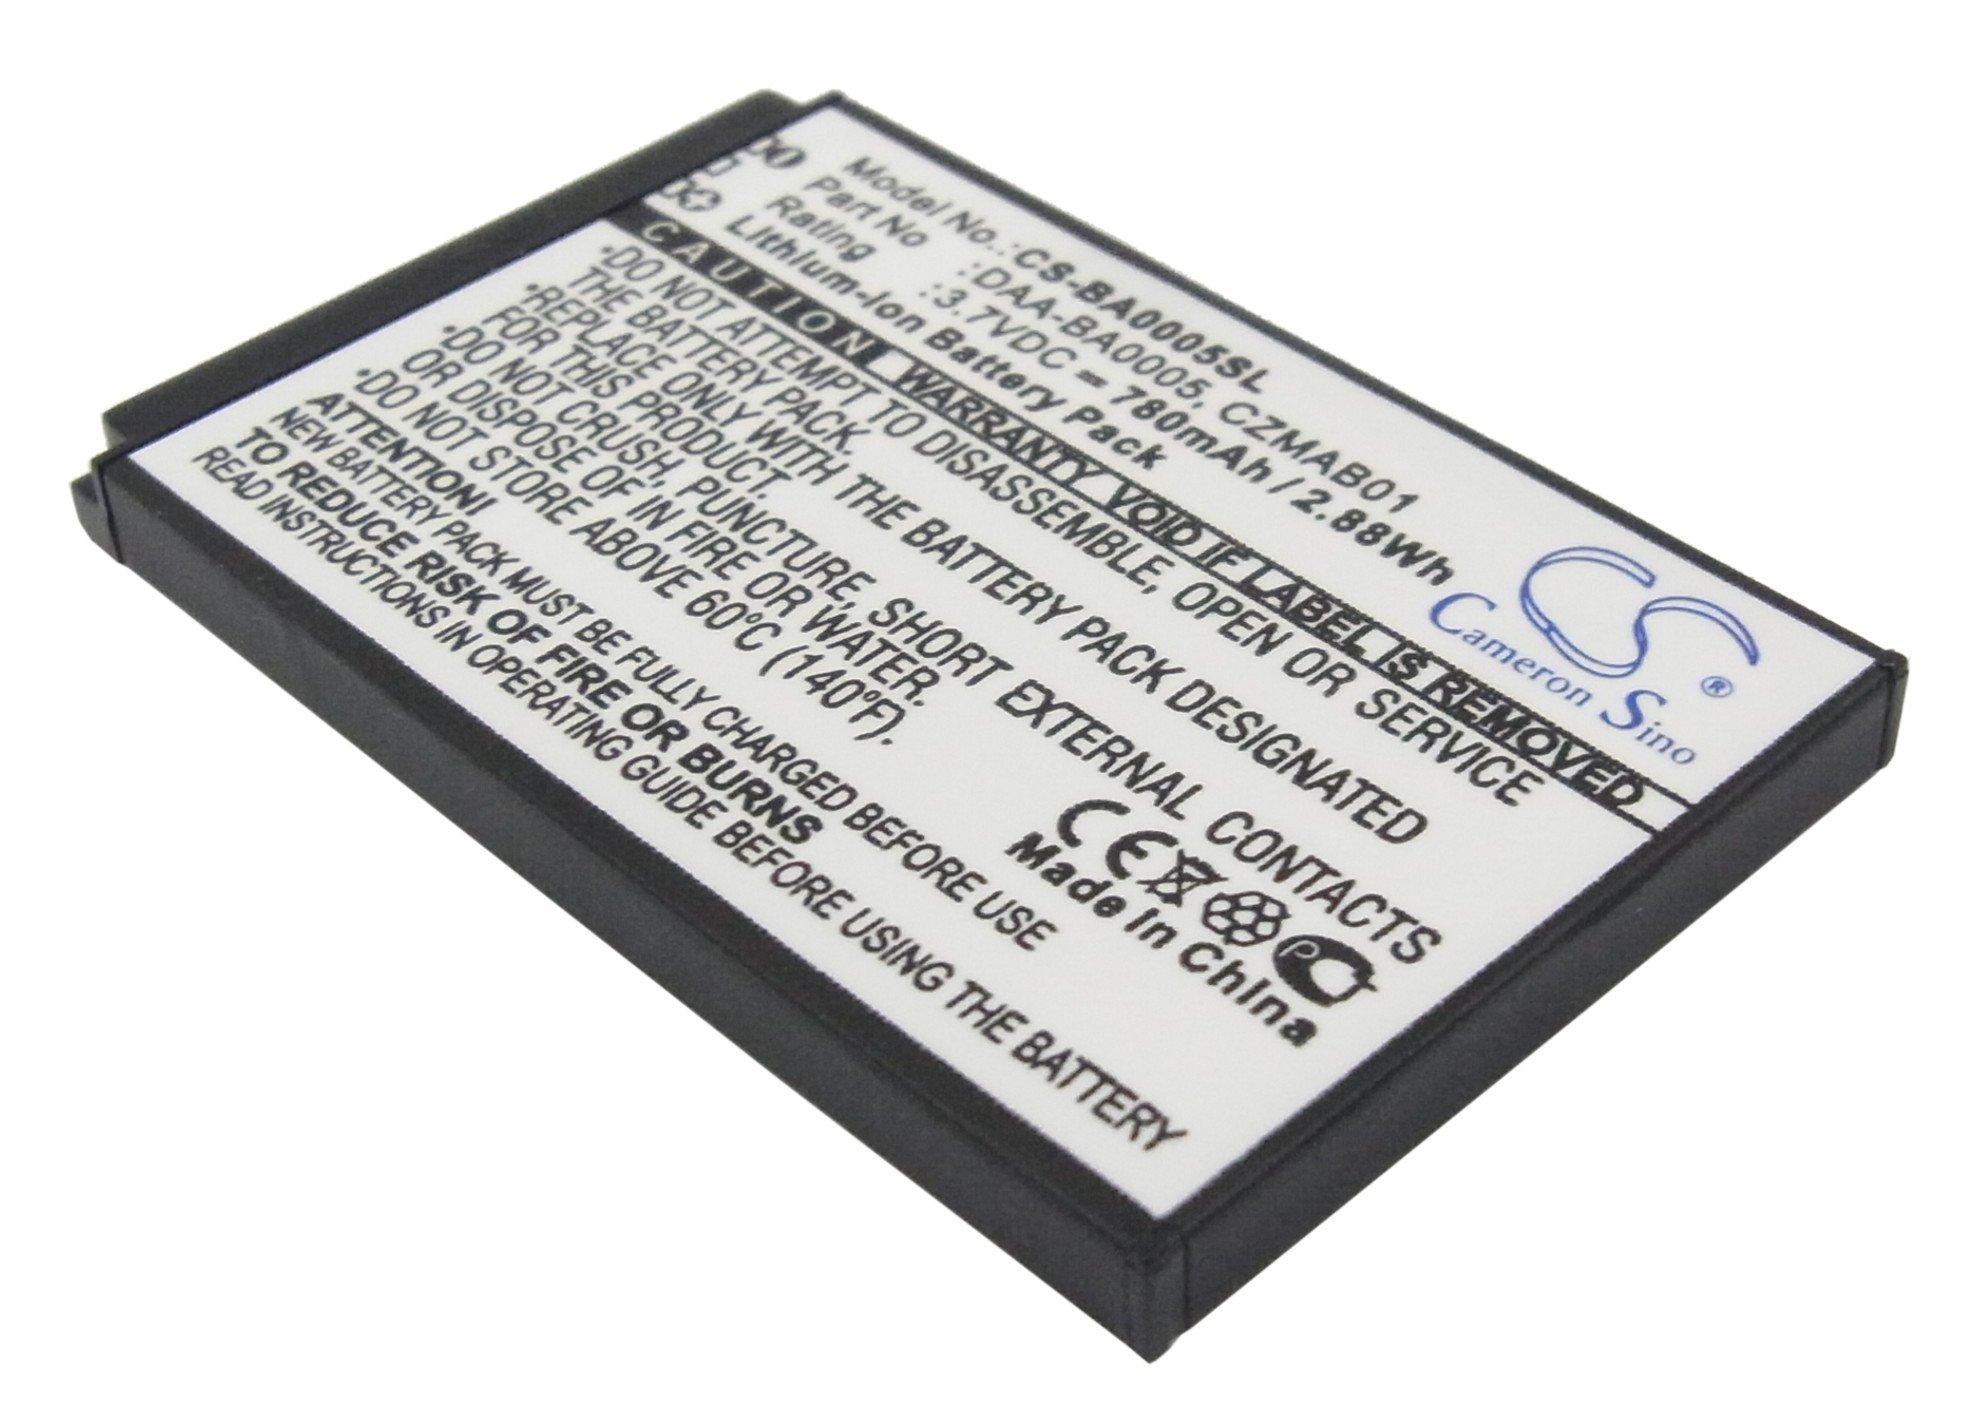 Cameron Sino 780mAh Battery for Creative Zen Micro, Zen Micro 4GB, Zen Micro 5GB, Zen Micro 6GB, Zen Micro Photo